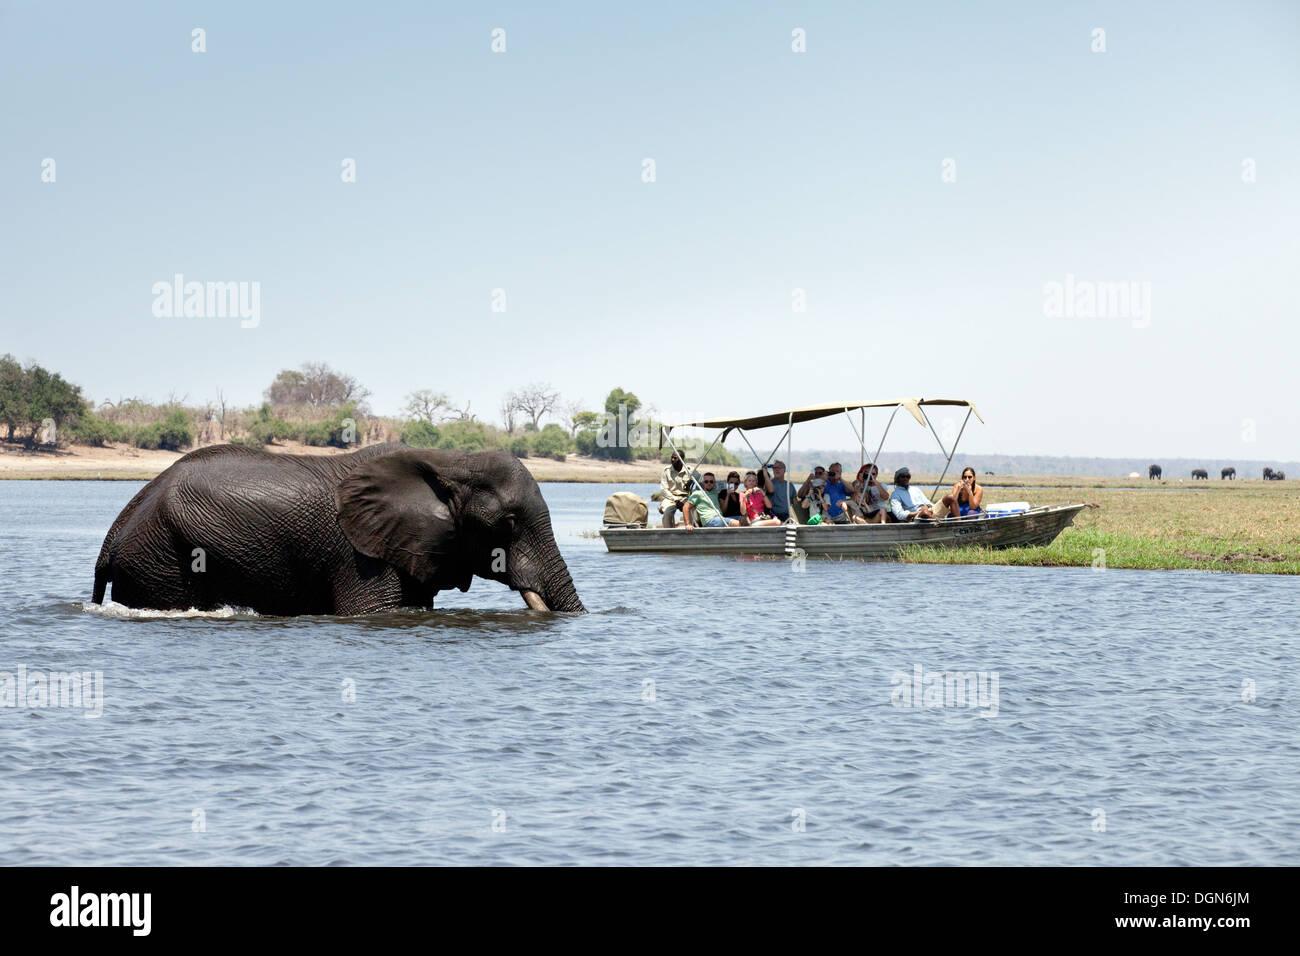 Tourists on an africa safari watching an elephant crossing the Chobe river, Chobe National Park, Botswana Africa Stock Photo